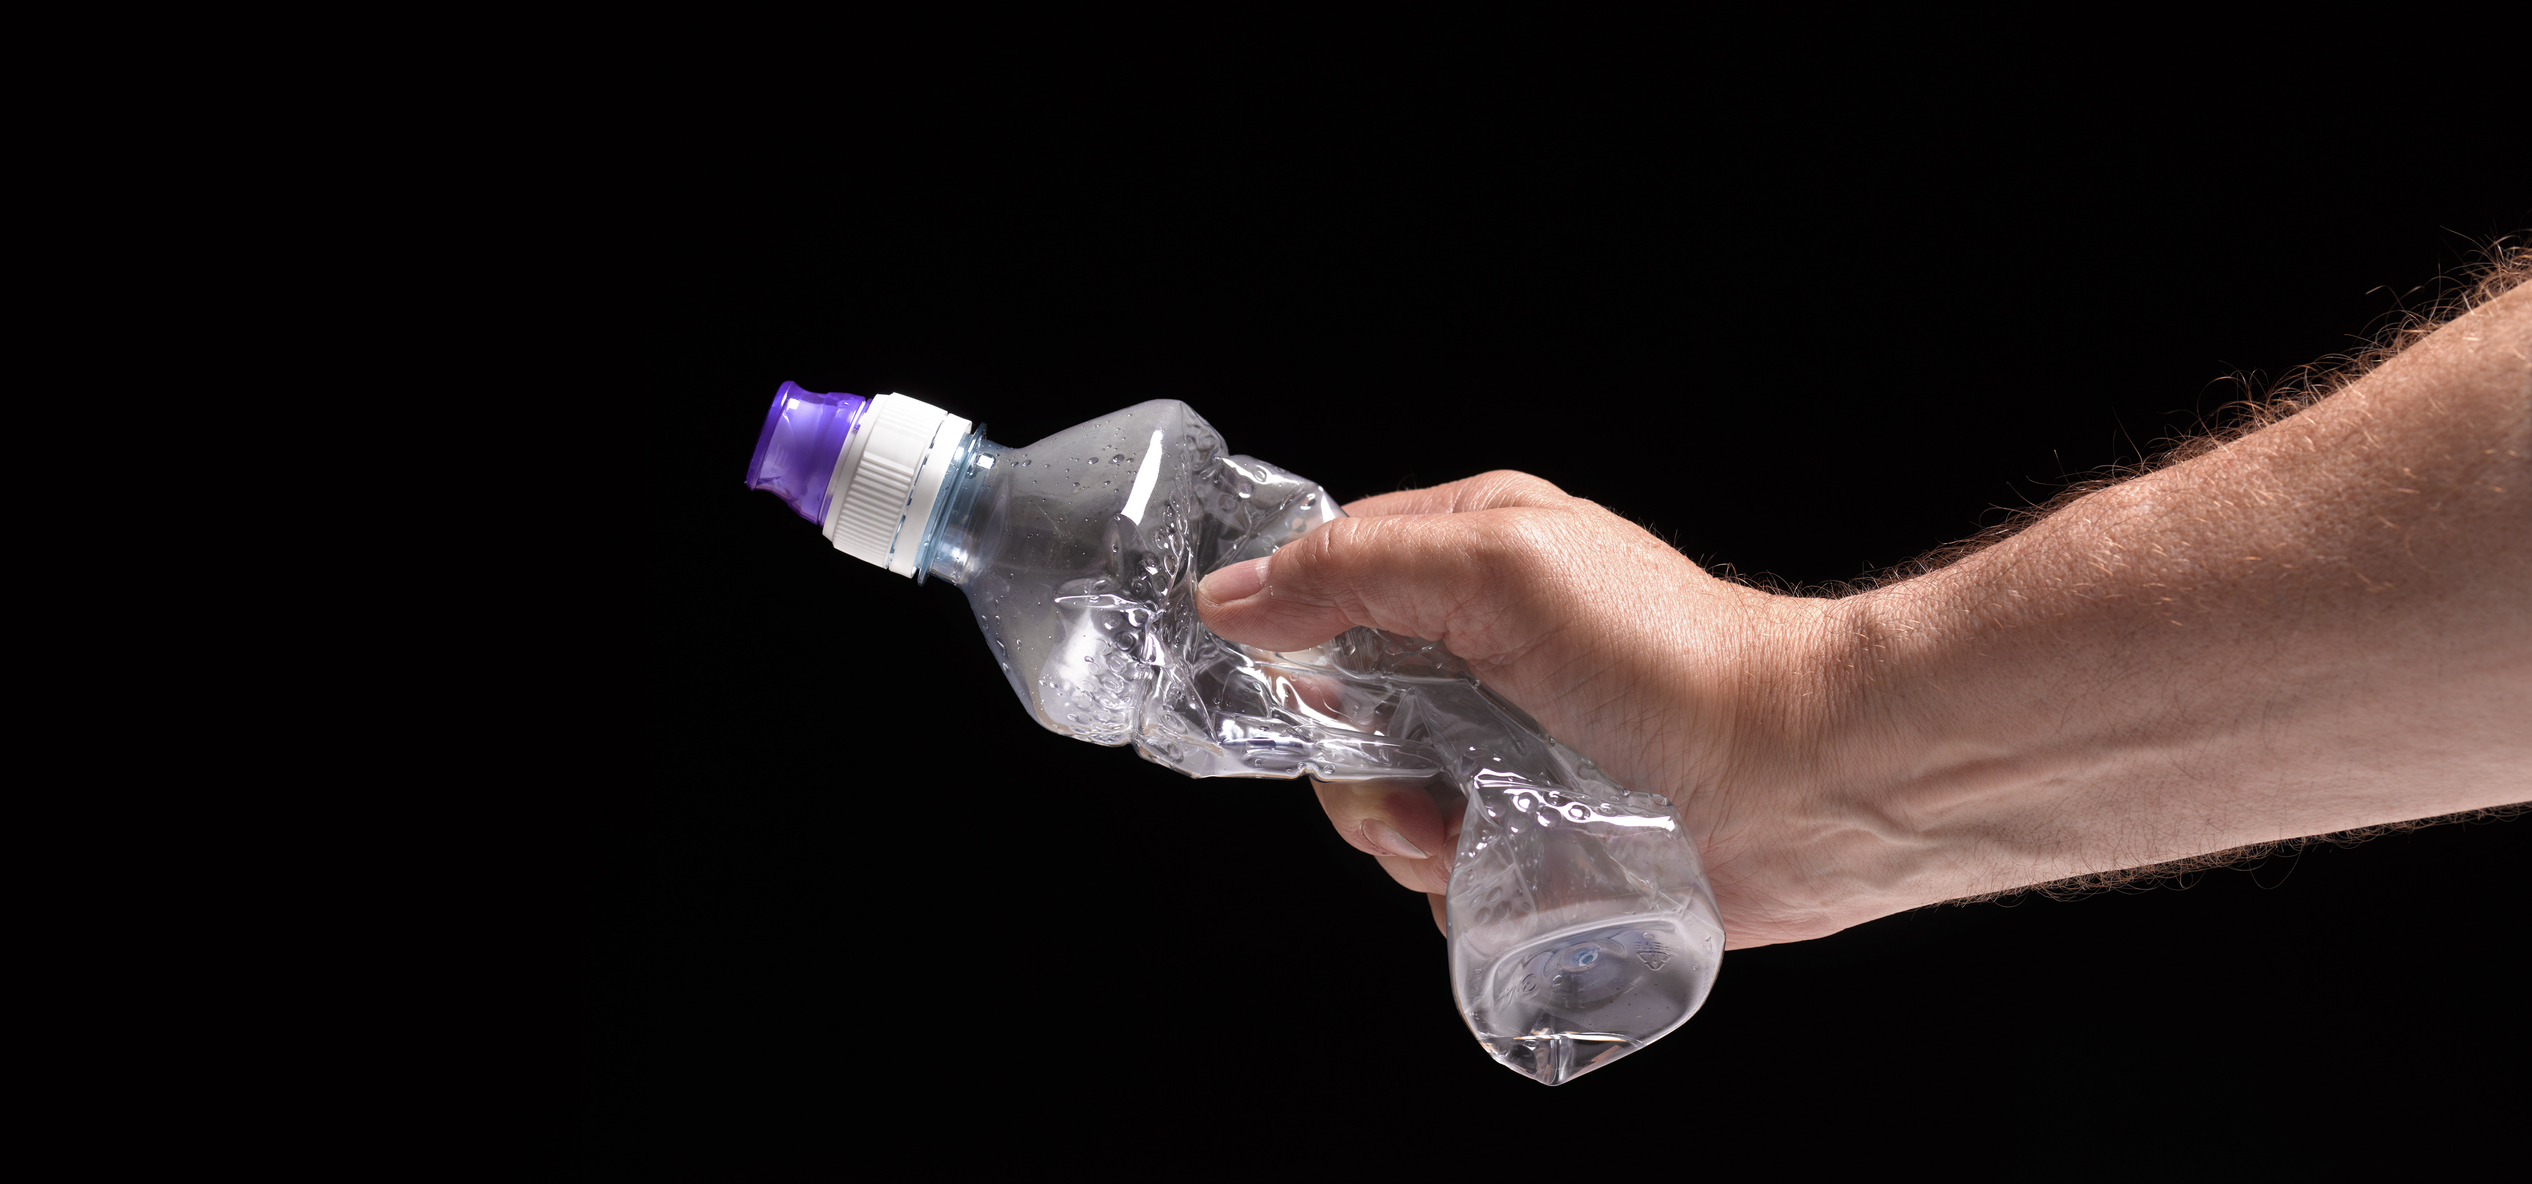 menjen vékonyabb műanyag